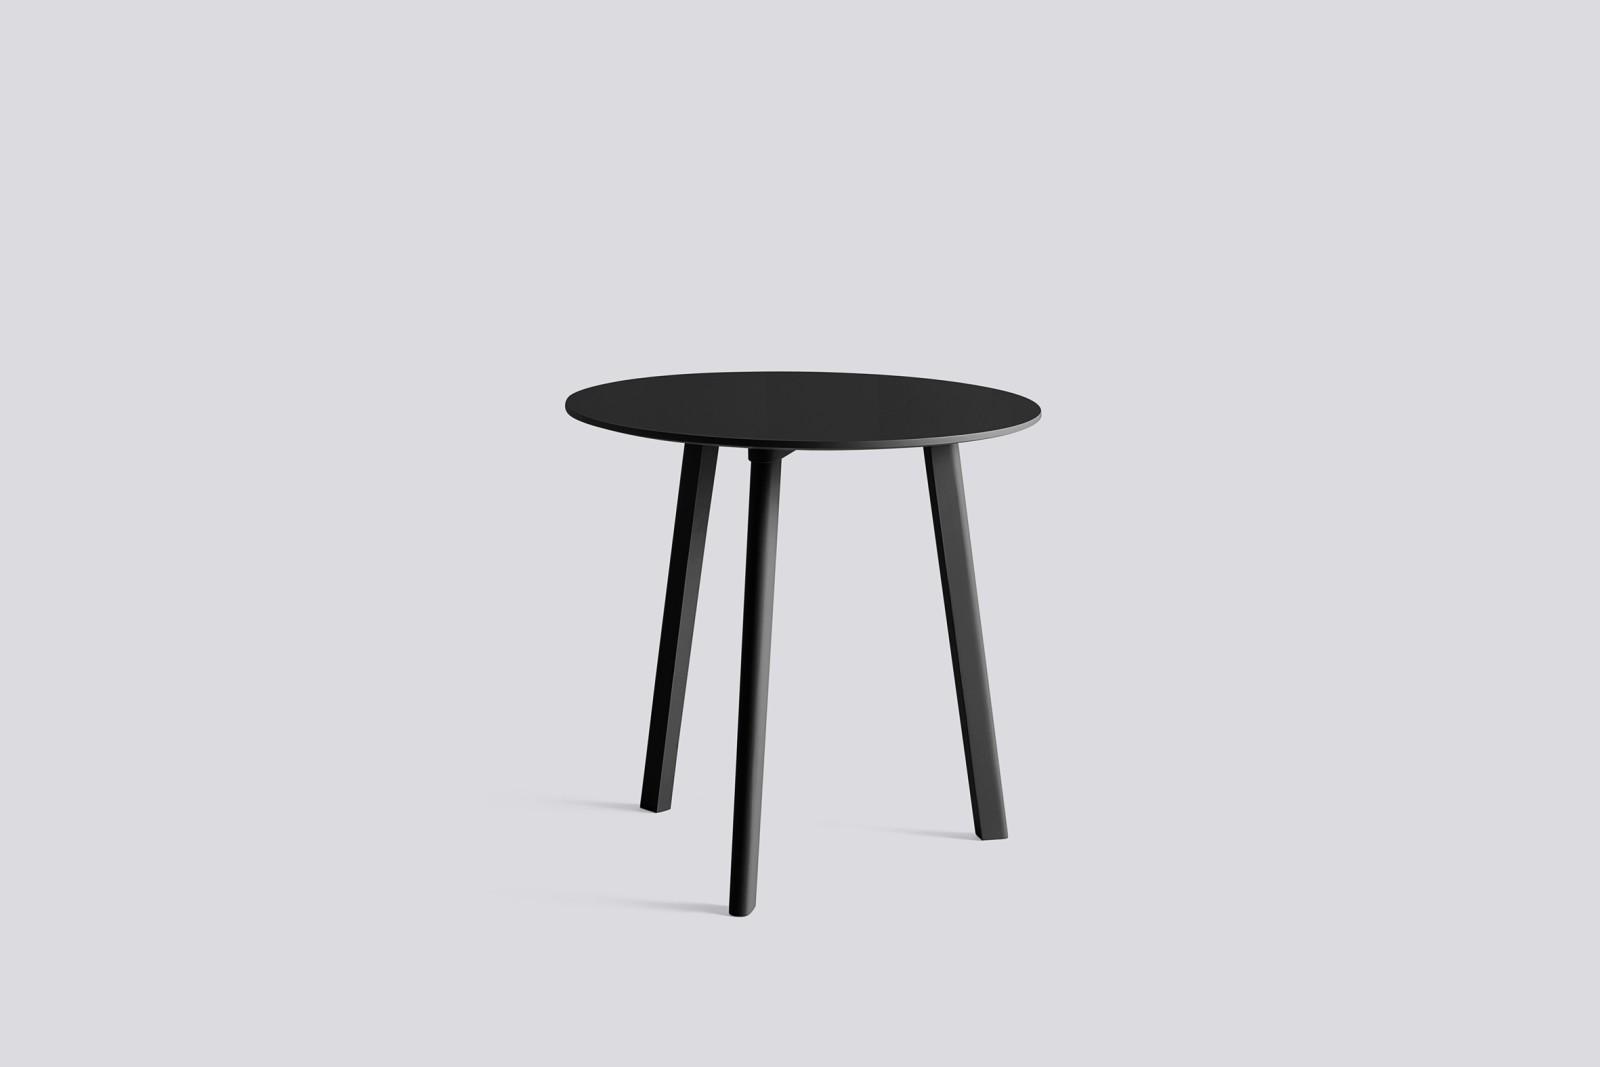 Copenhague Deux (CPH 220) Round Dining Table Stone Grey Lamniate Top, Stone Grey Beech Top, 75 cm